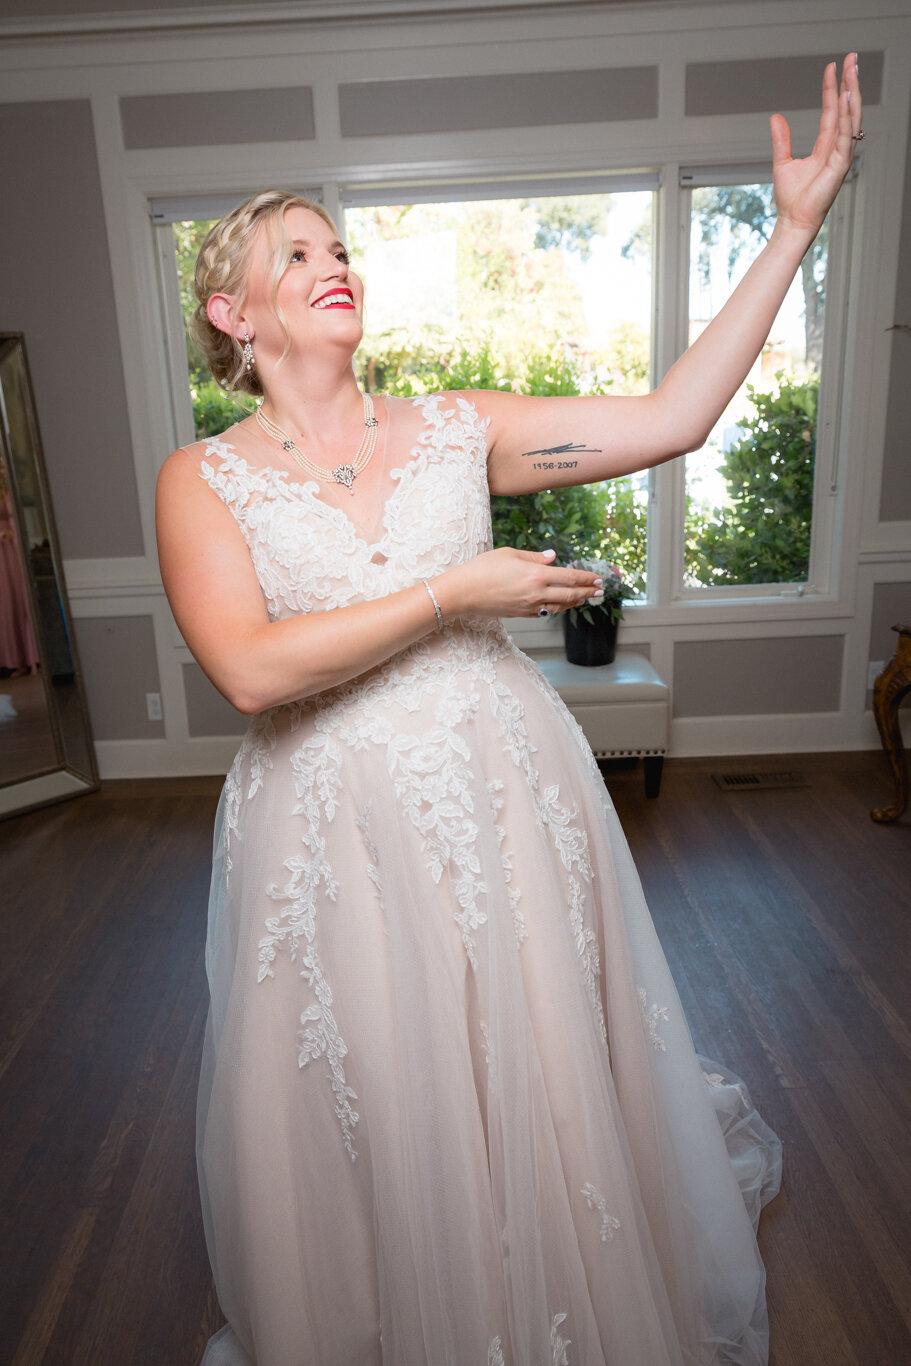 2019.08.24_Emily-Ashir-Wedding-at-the-Maples-5224.jpg